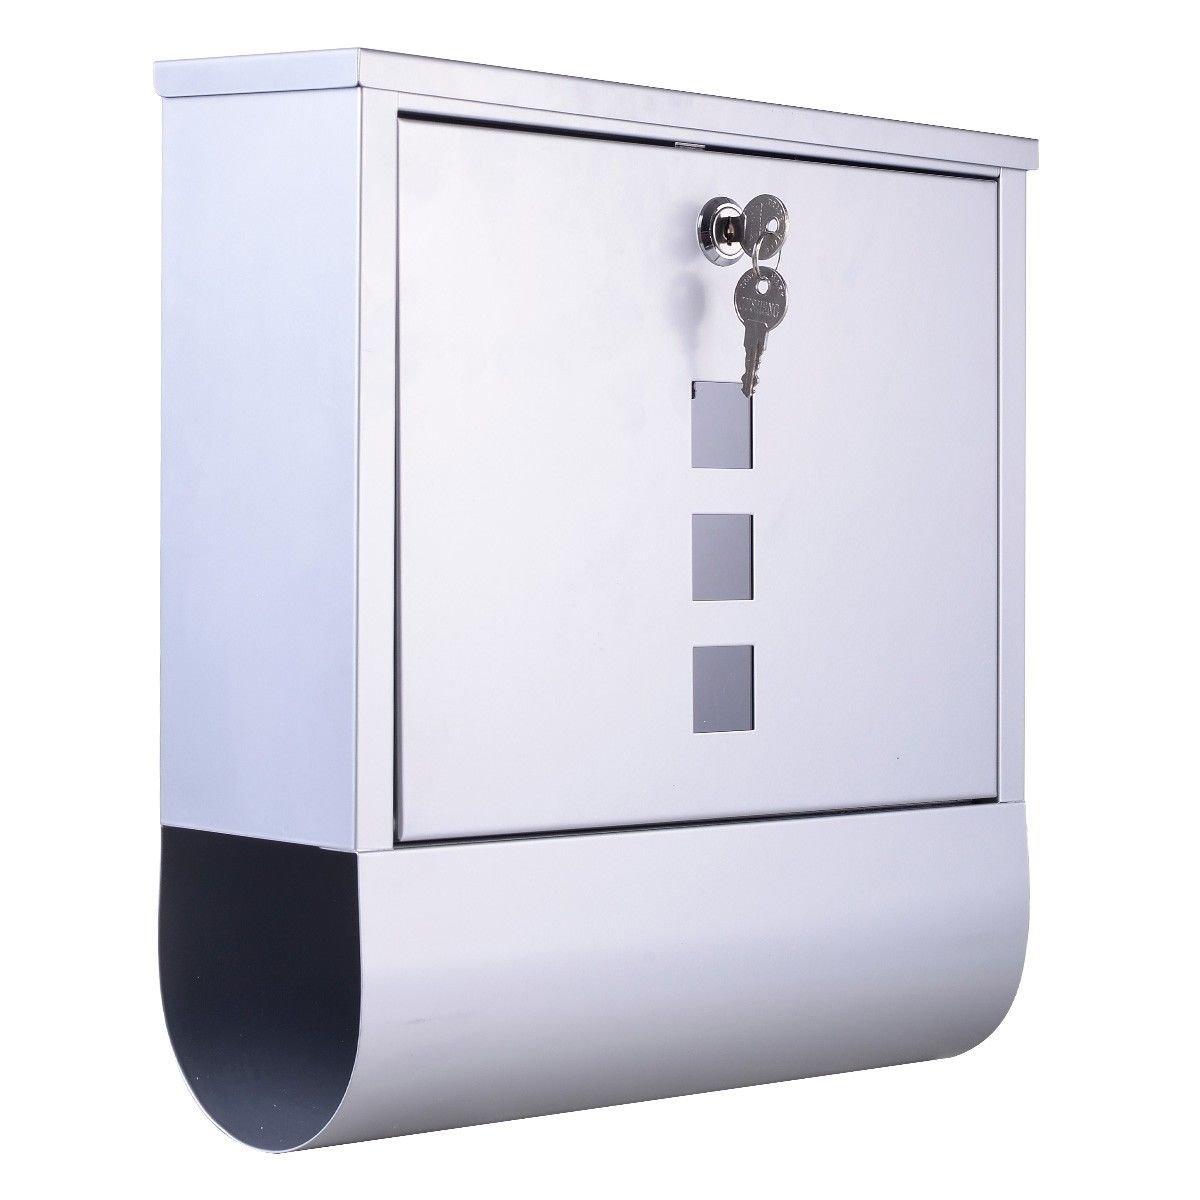 Wall Mount Mail Box Steel With Newspaper Roll w/ Retrieval Door & 2 Key New